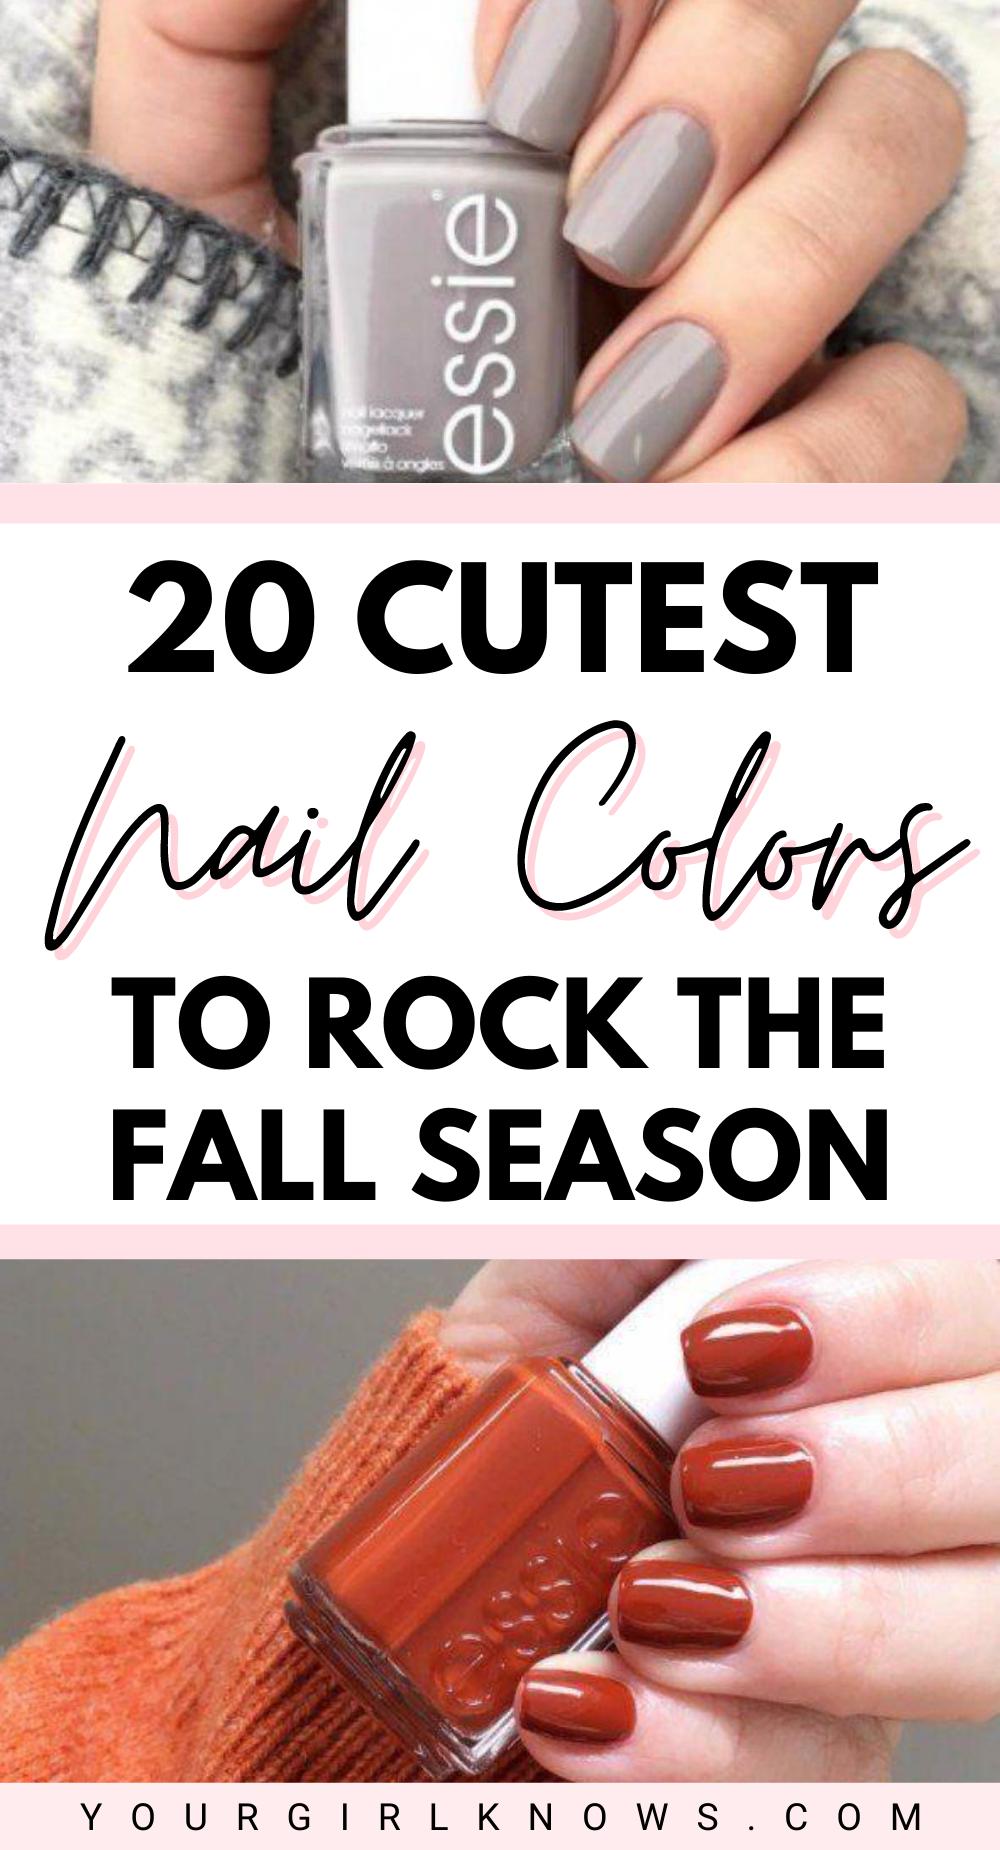 20 Best Fall Nail Colors 2020 Fall Nail Colors Acrylic Fall Nail Colors Gel Polish Ygk In 2020 Fall Gel Nails Nail Polish Colors Fall Cute Nail Colors